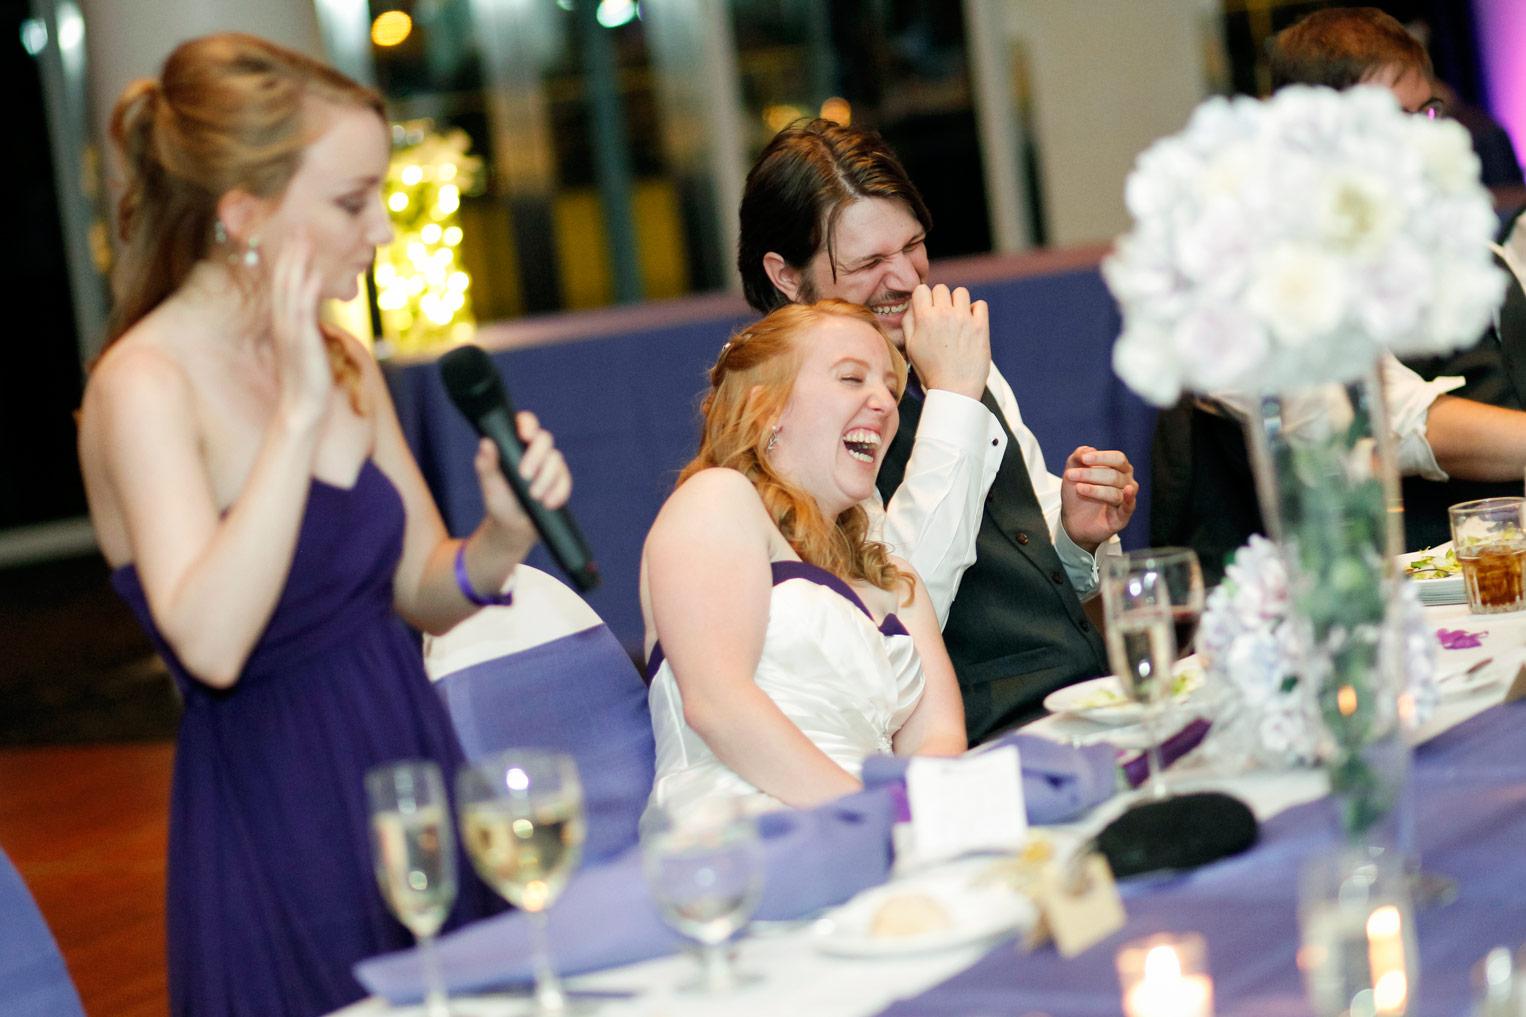 milwaukee-discovery-world-pier-wisconsin-wedding-ruthie-hauge-photography-53.jpg